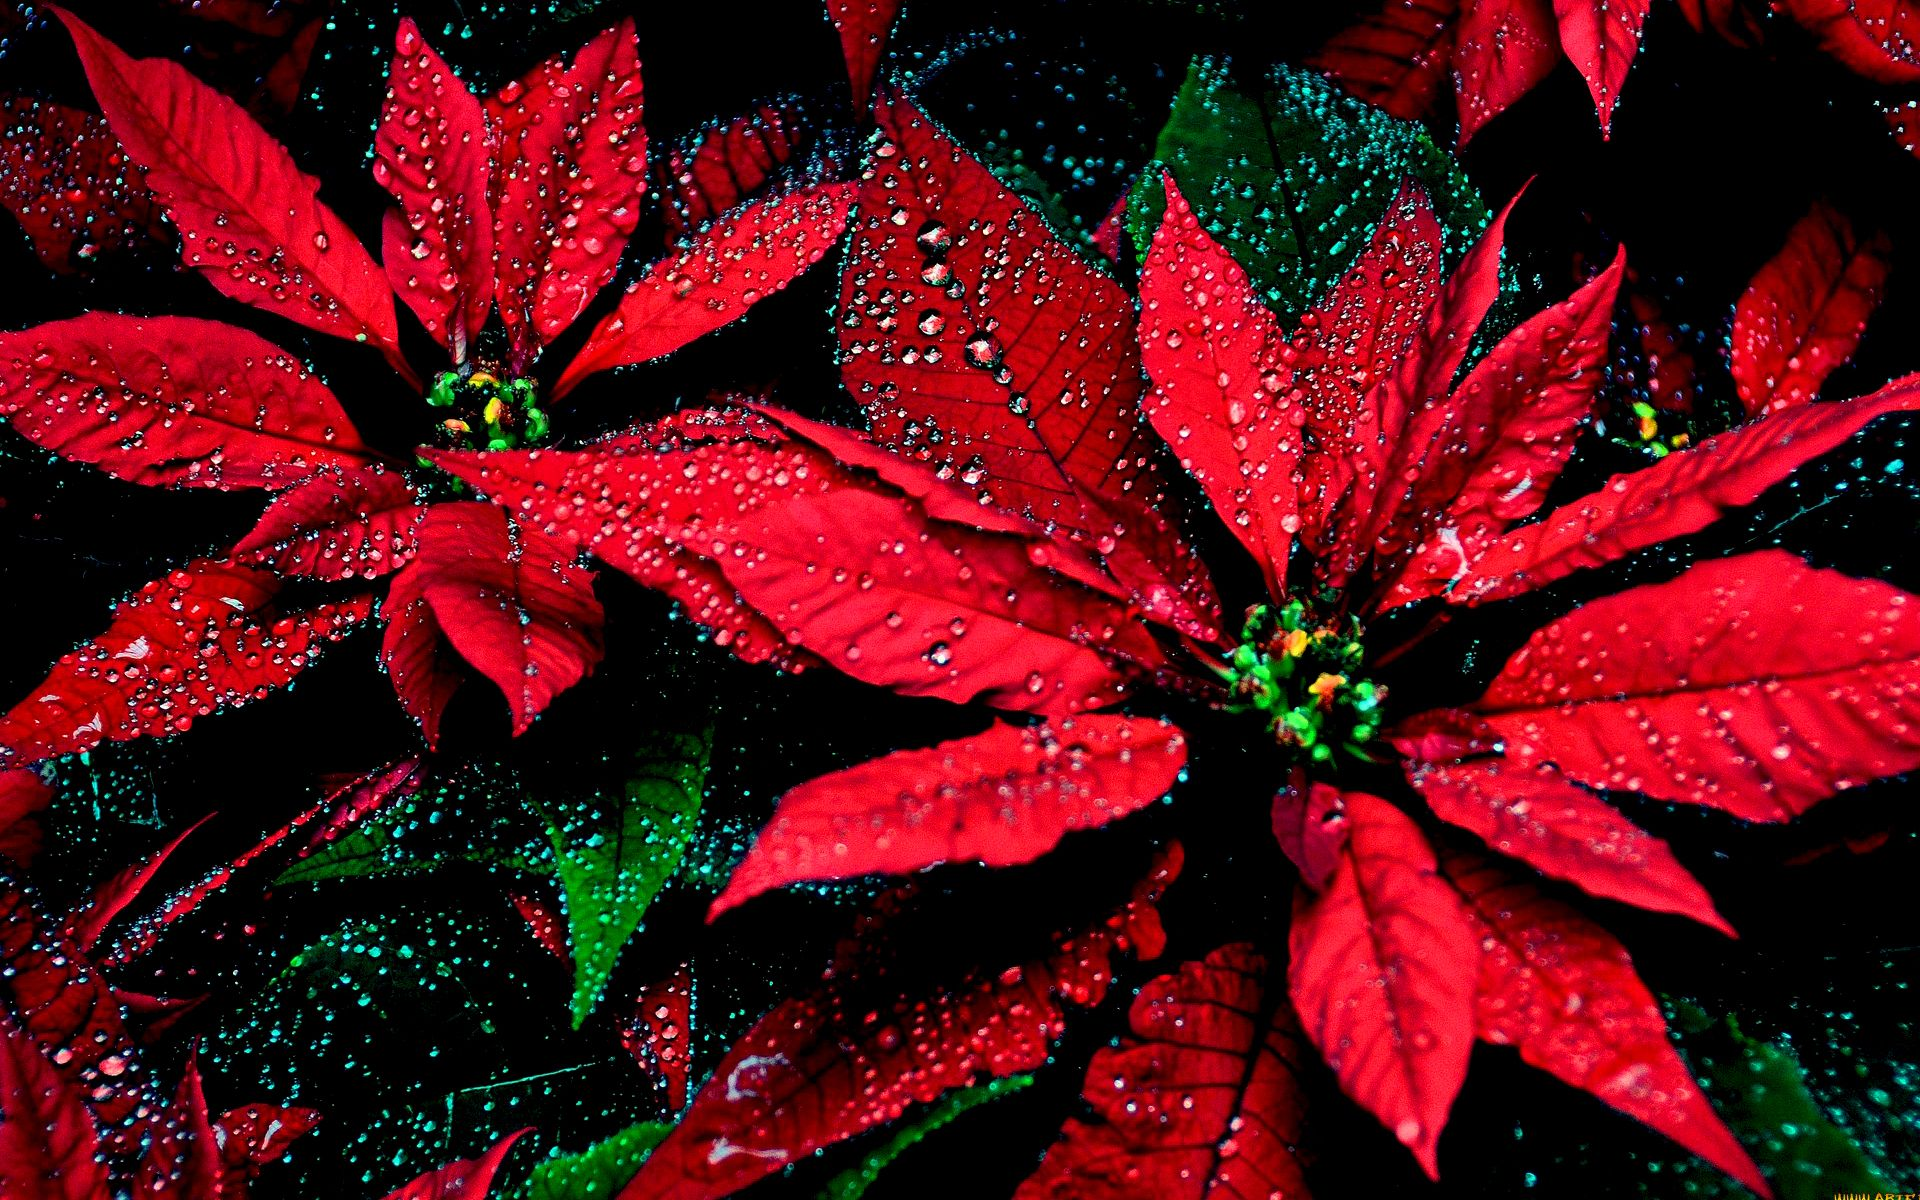 Poinsettia HD Wallpaper Background Image 1920x1200 ID370645 1920x1200